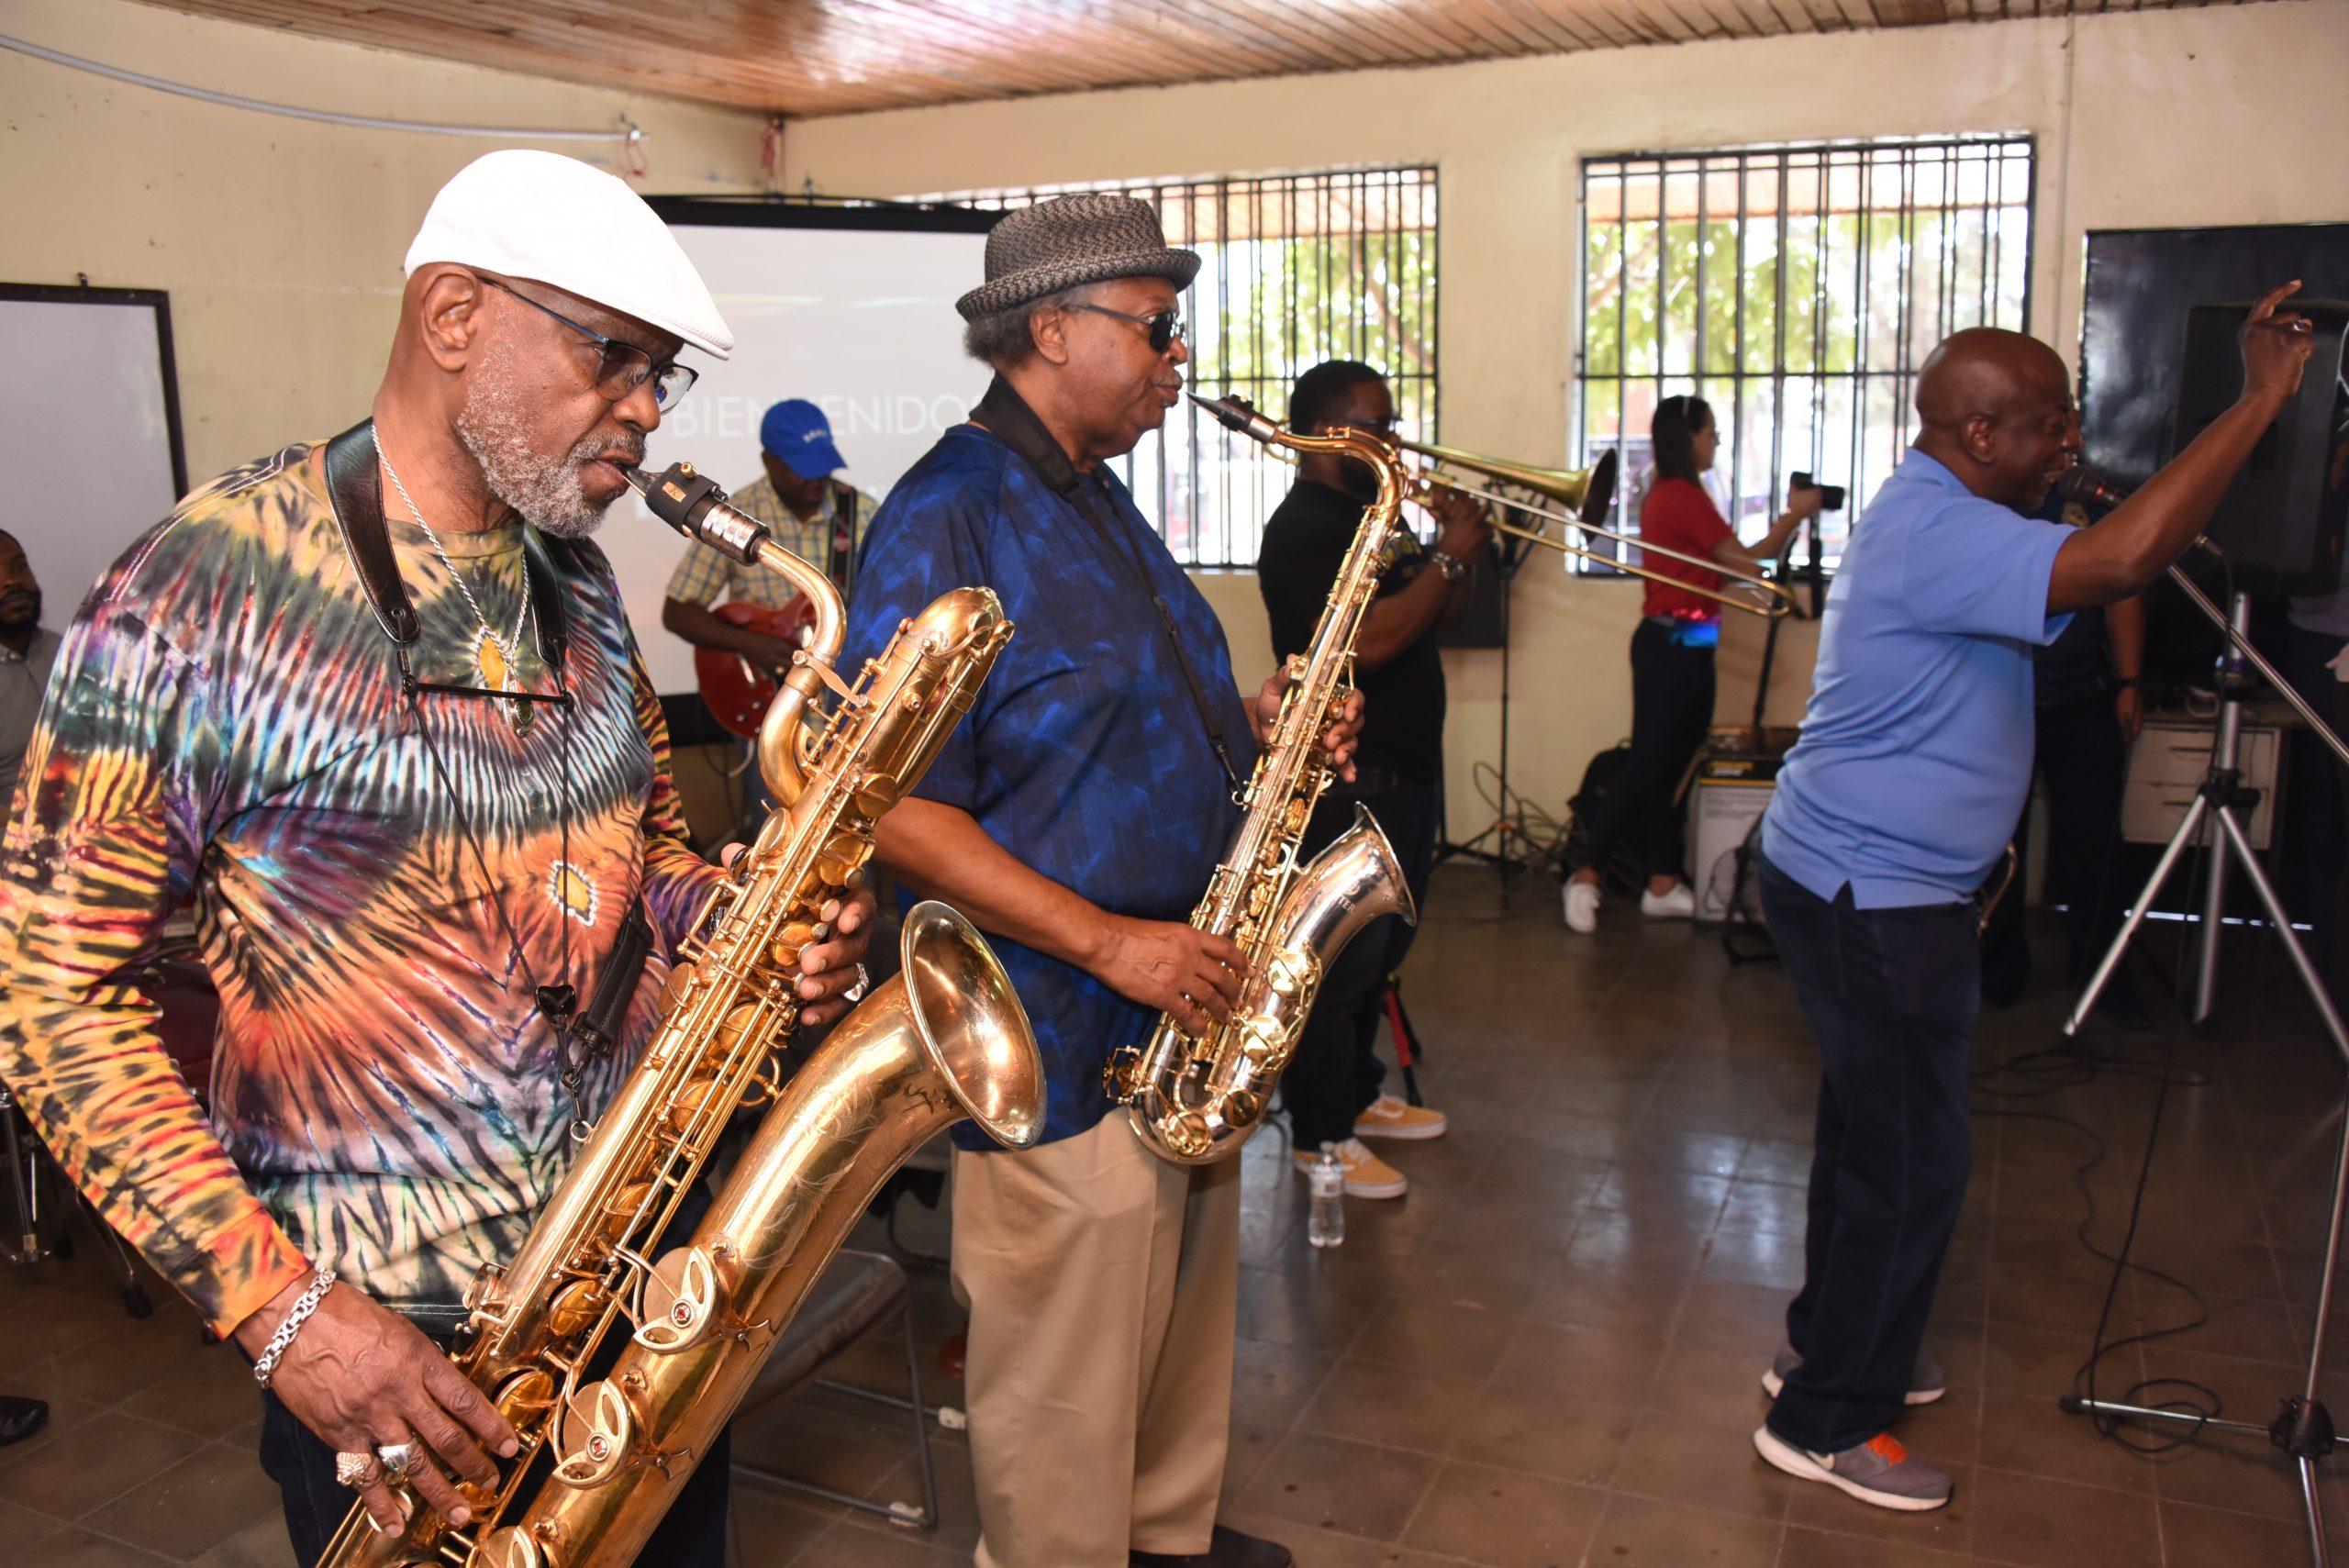 Embajada de EE.UU. presenta a Dirty Dozen Brass Band